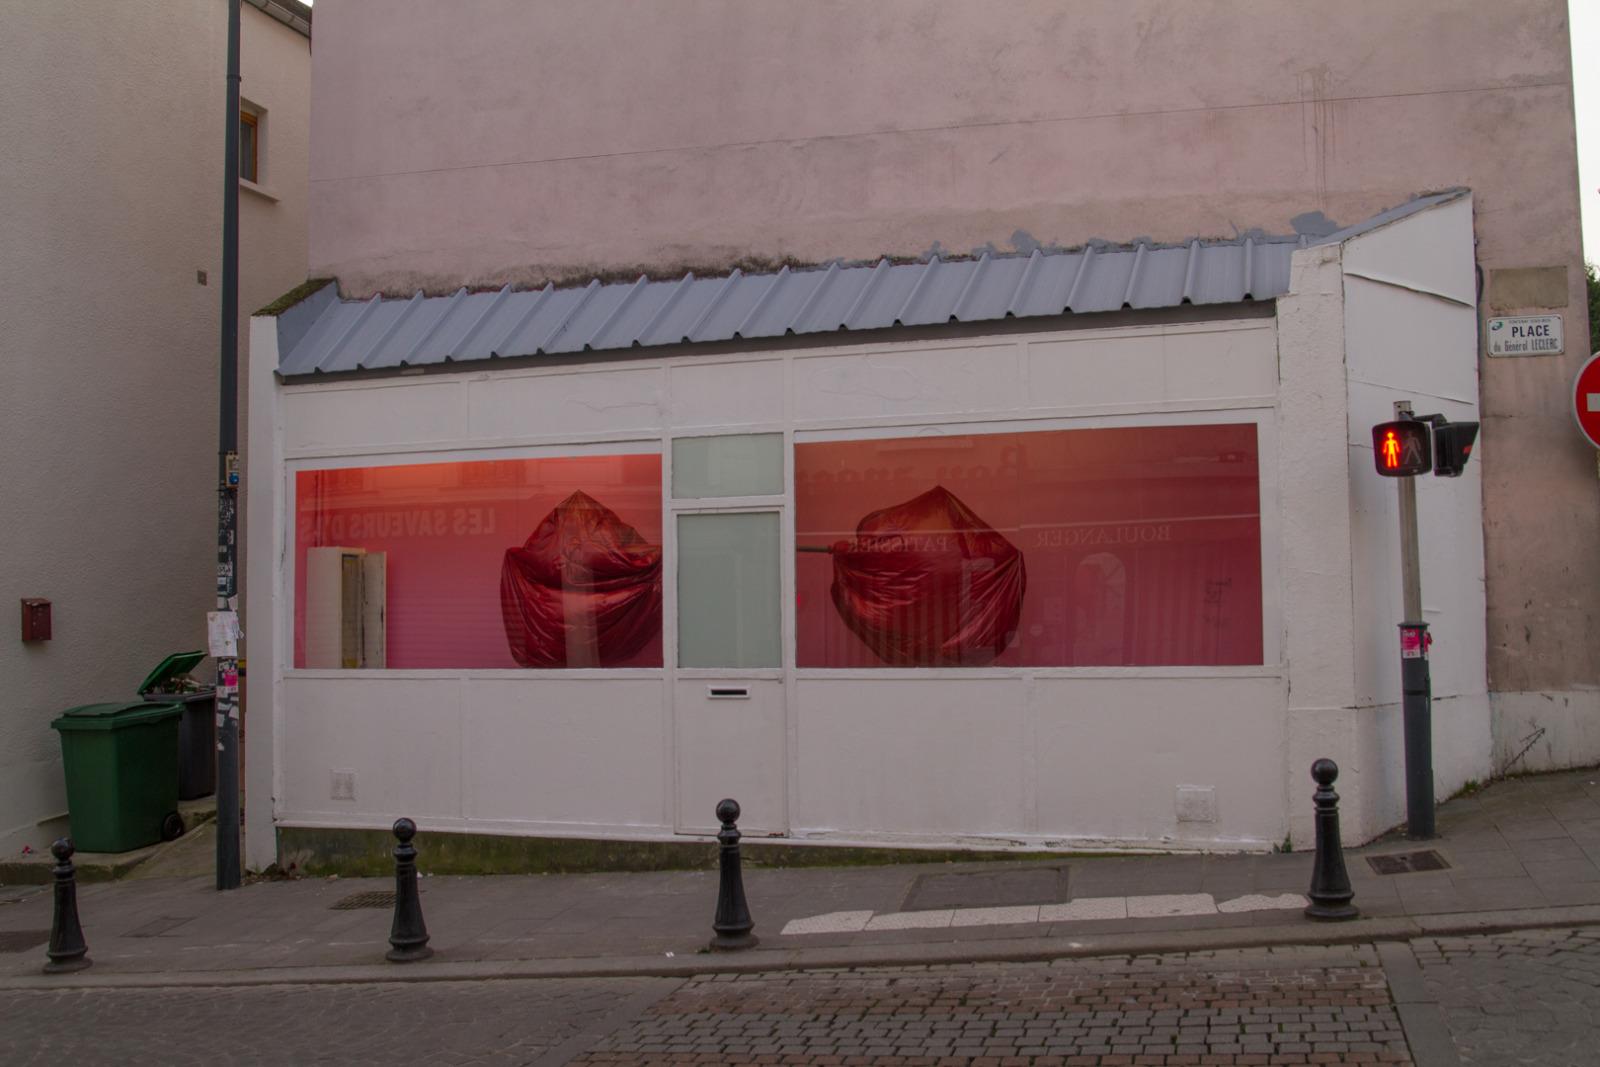 We Can't Breathe, 2015, Site specific Installation, 6m x 3m x 1 m, La Galeru, Fontenay-sous-bois, France.